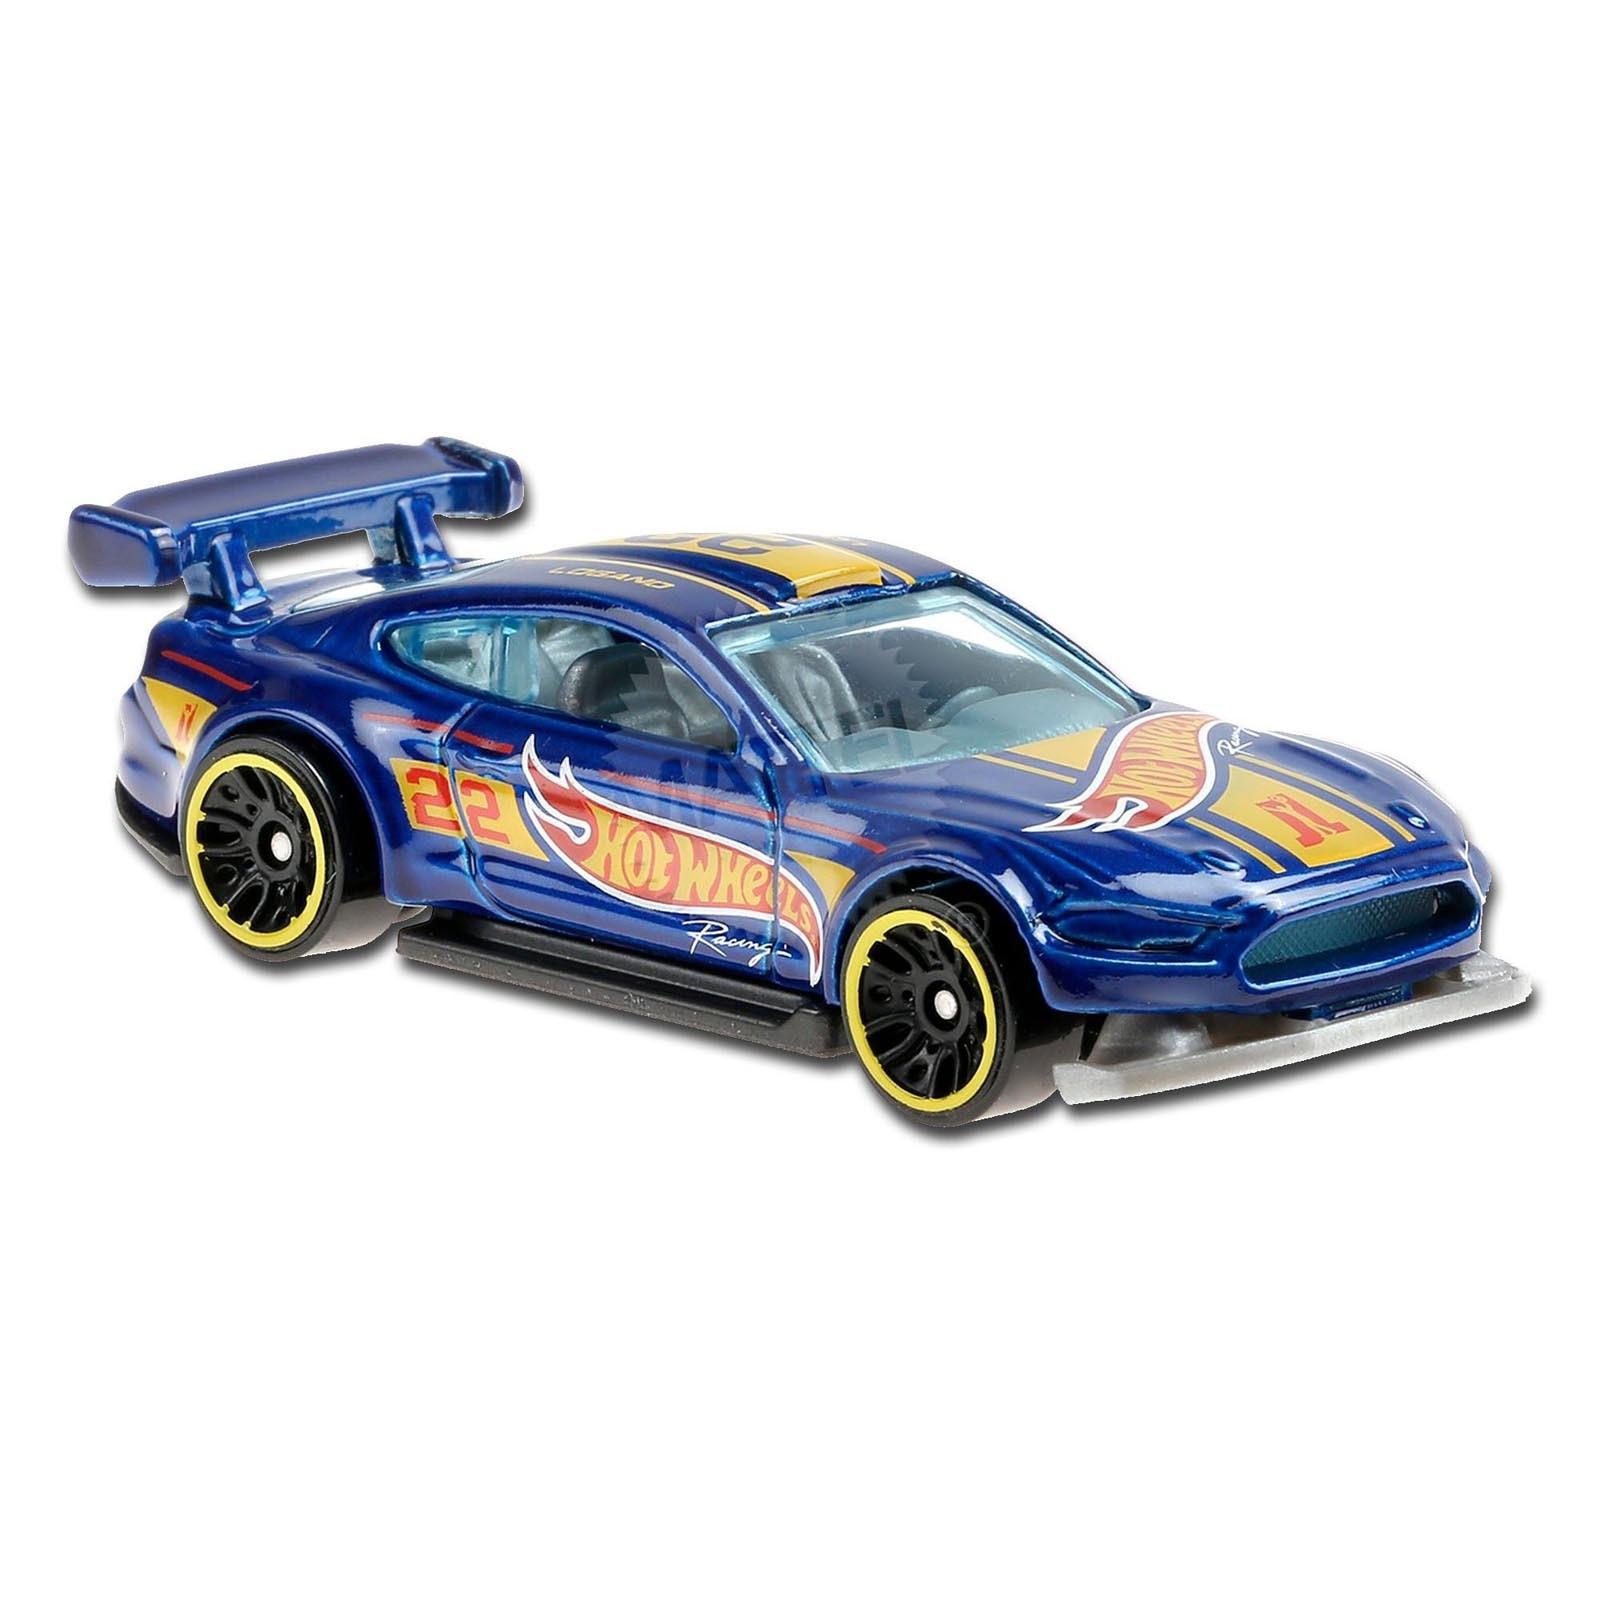 Hot Wheels - Custom '18 Ford Mustang GT - GHC59